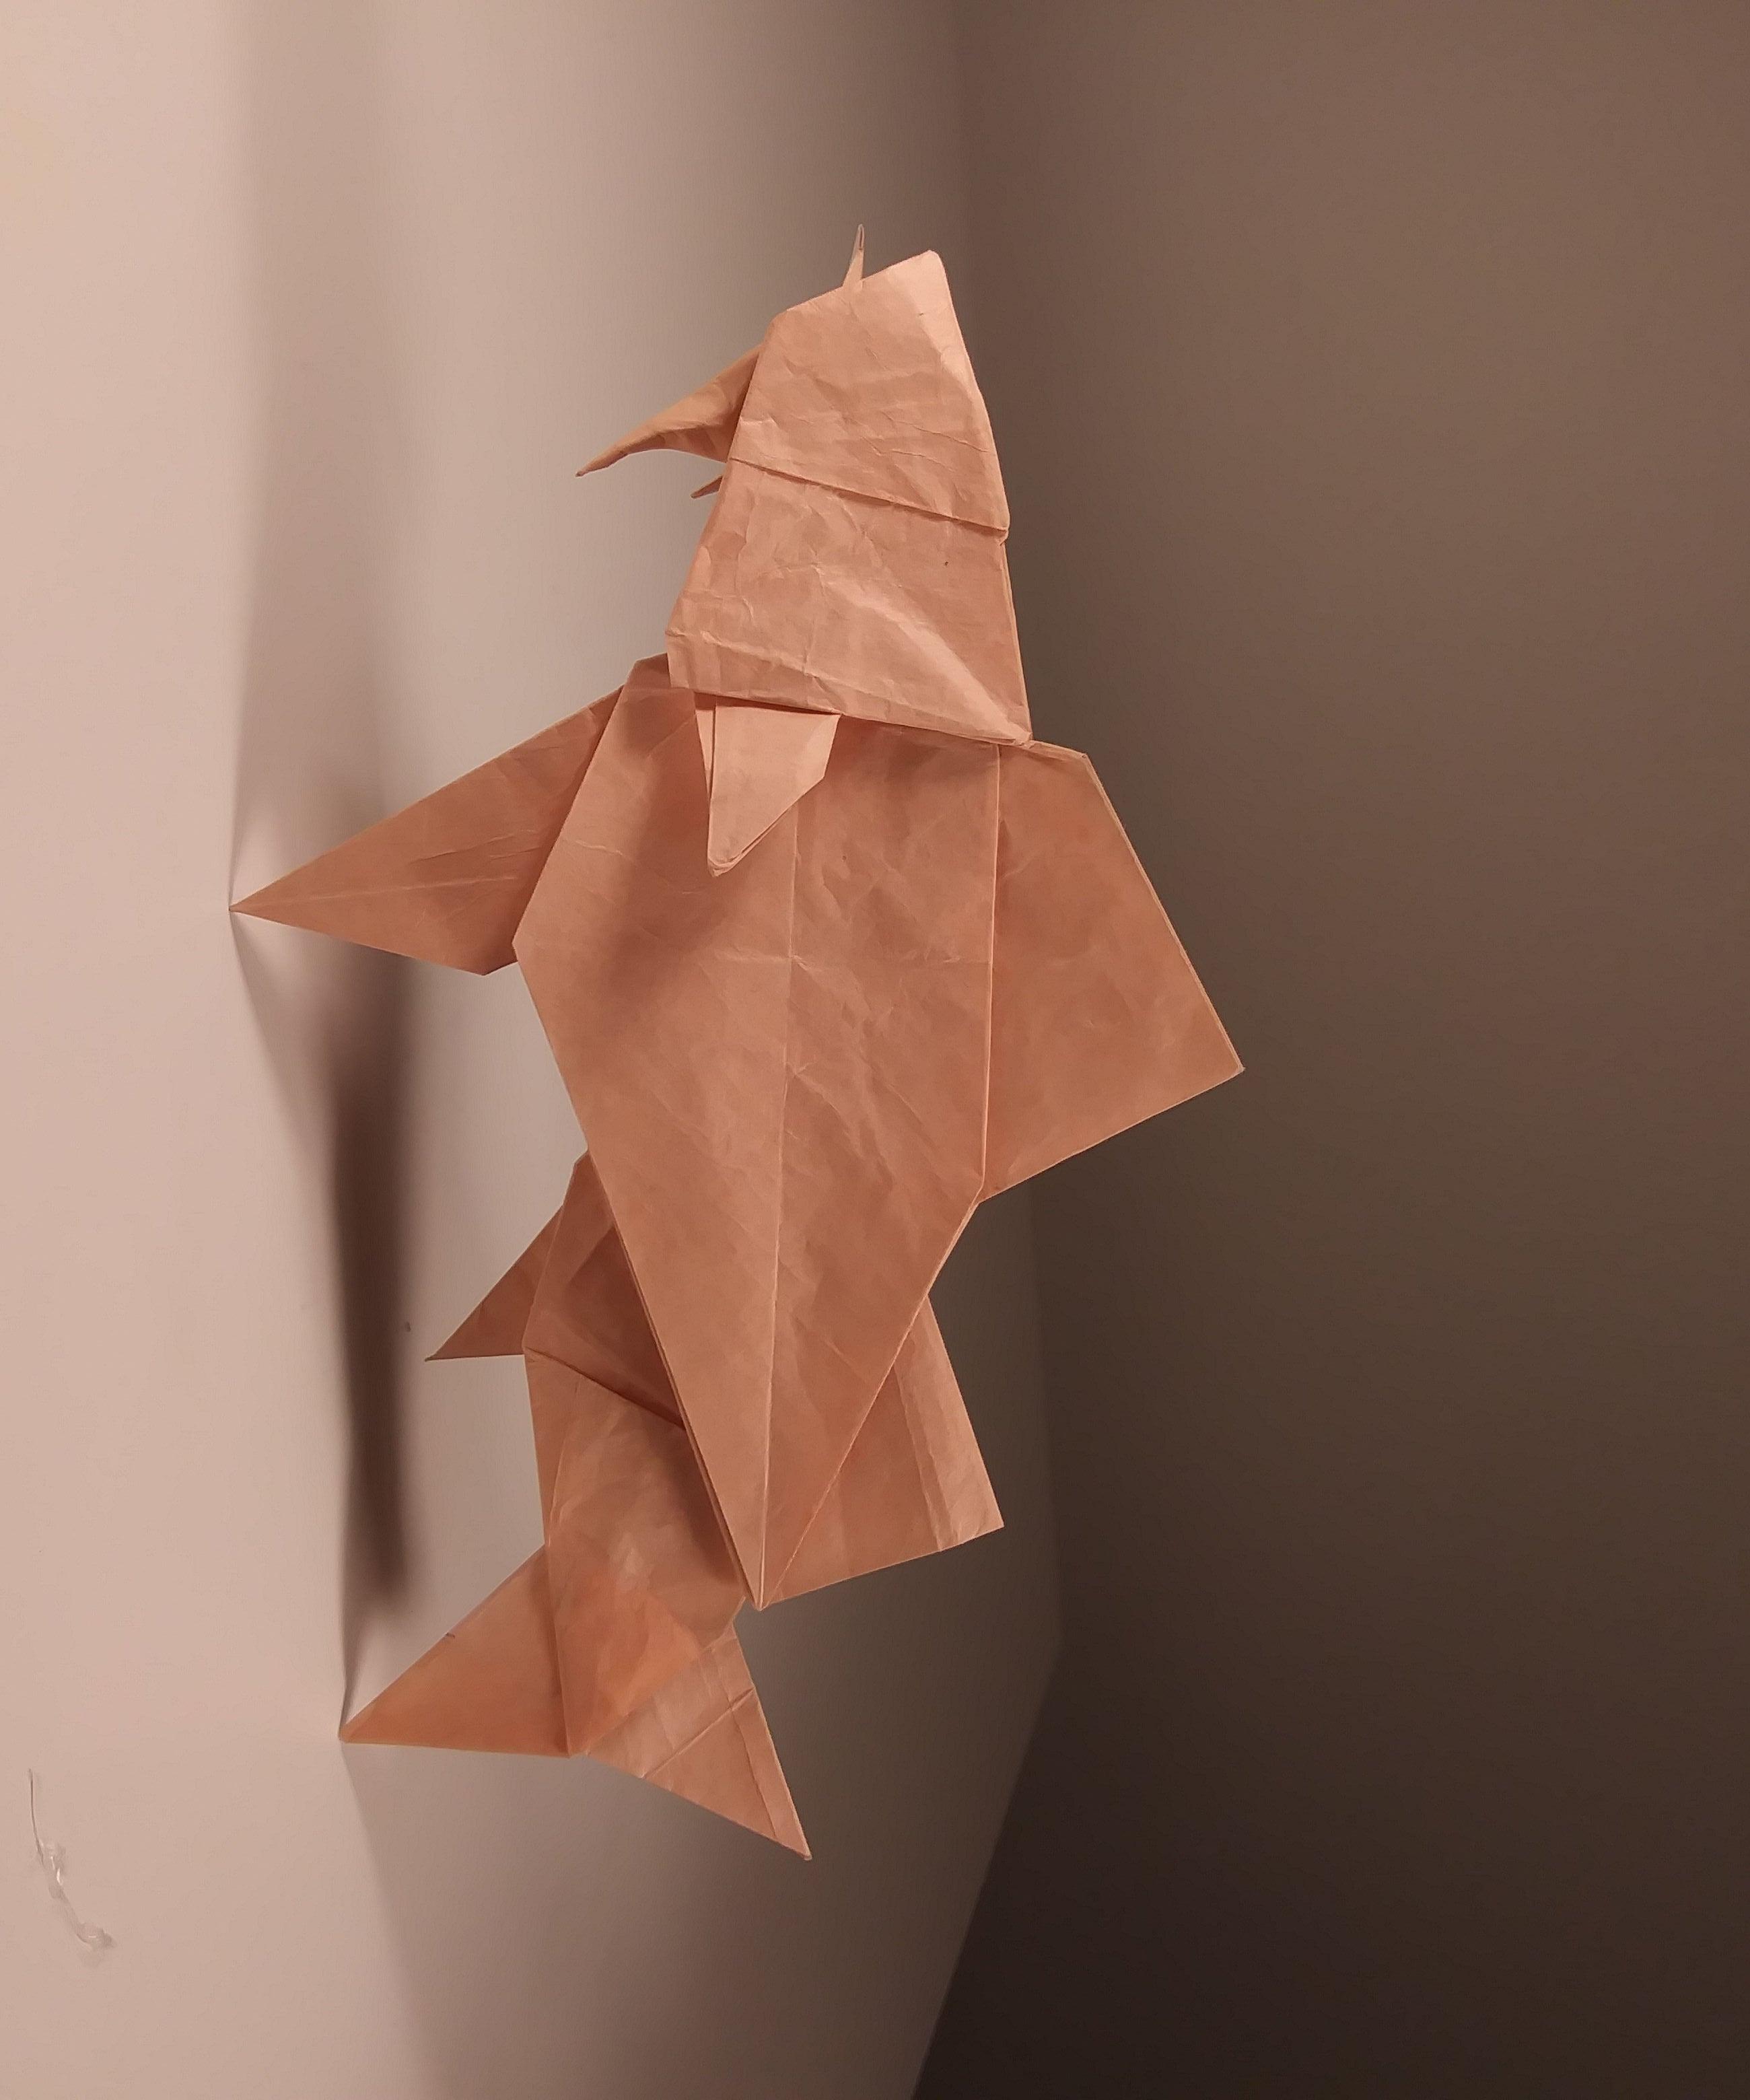 100 Origami Paper Cranes 6 inches Origami Paper Cranes white 15 cm ...   3120x2600